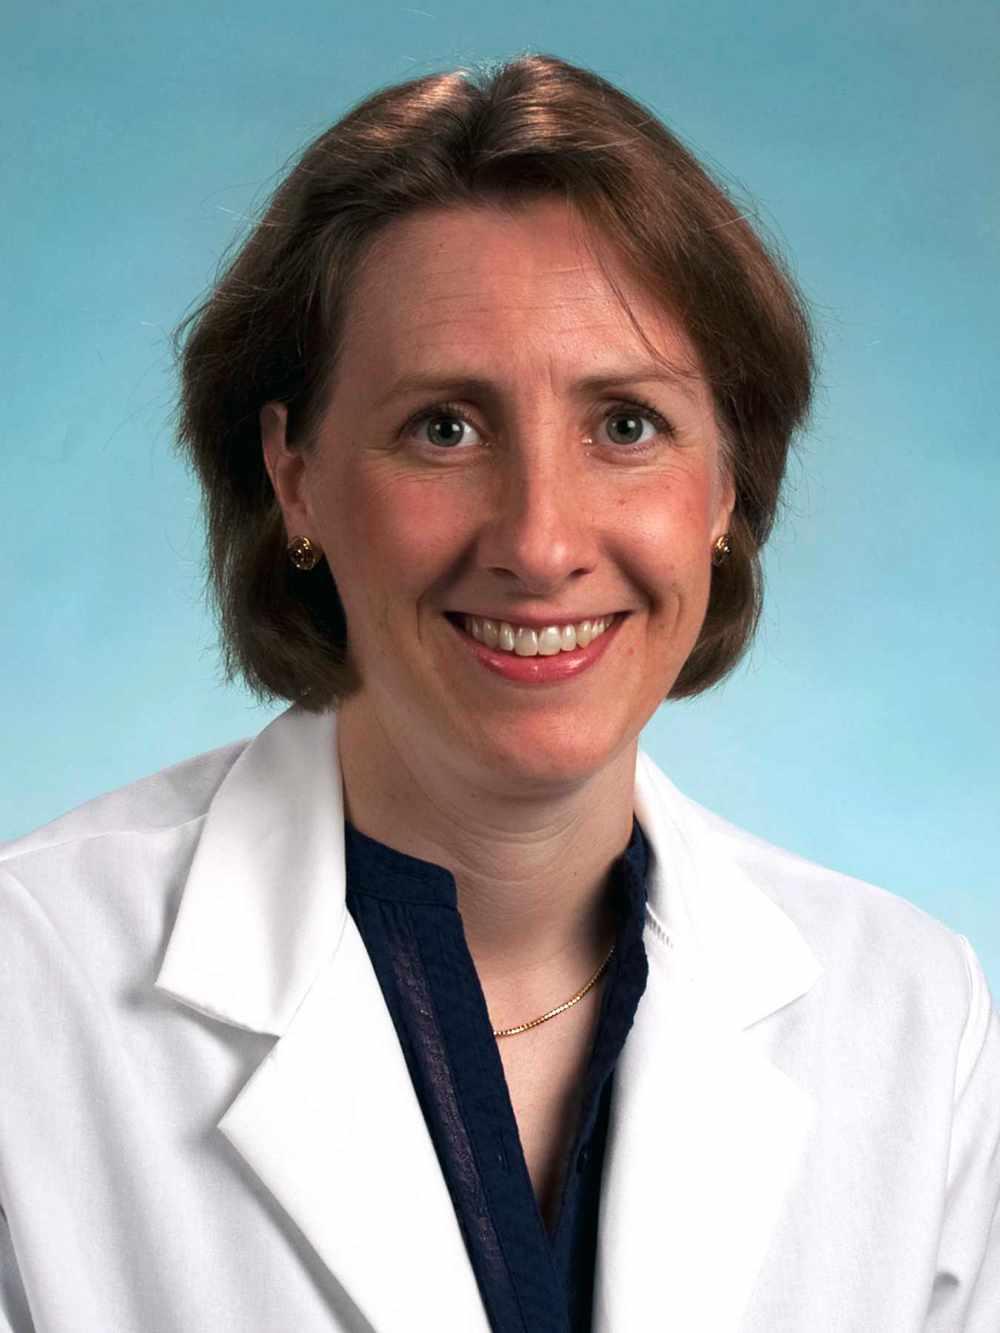 Alexa Craig, MD, MSc